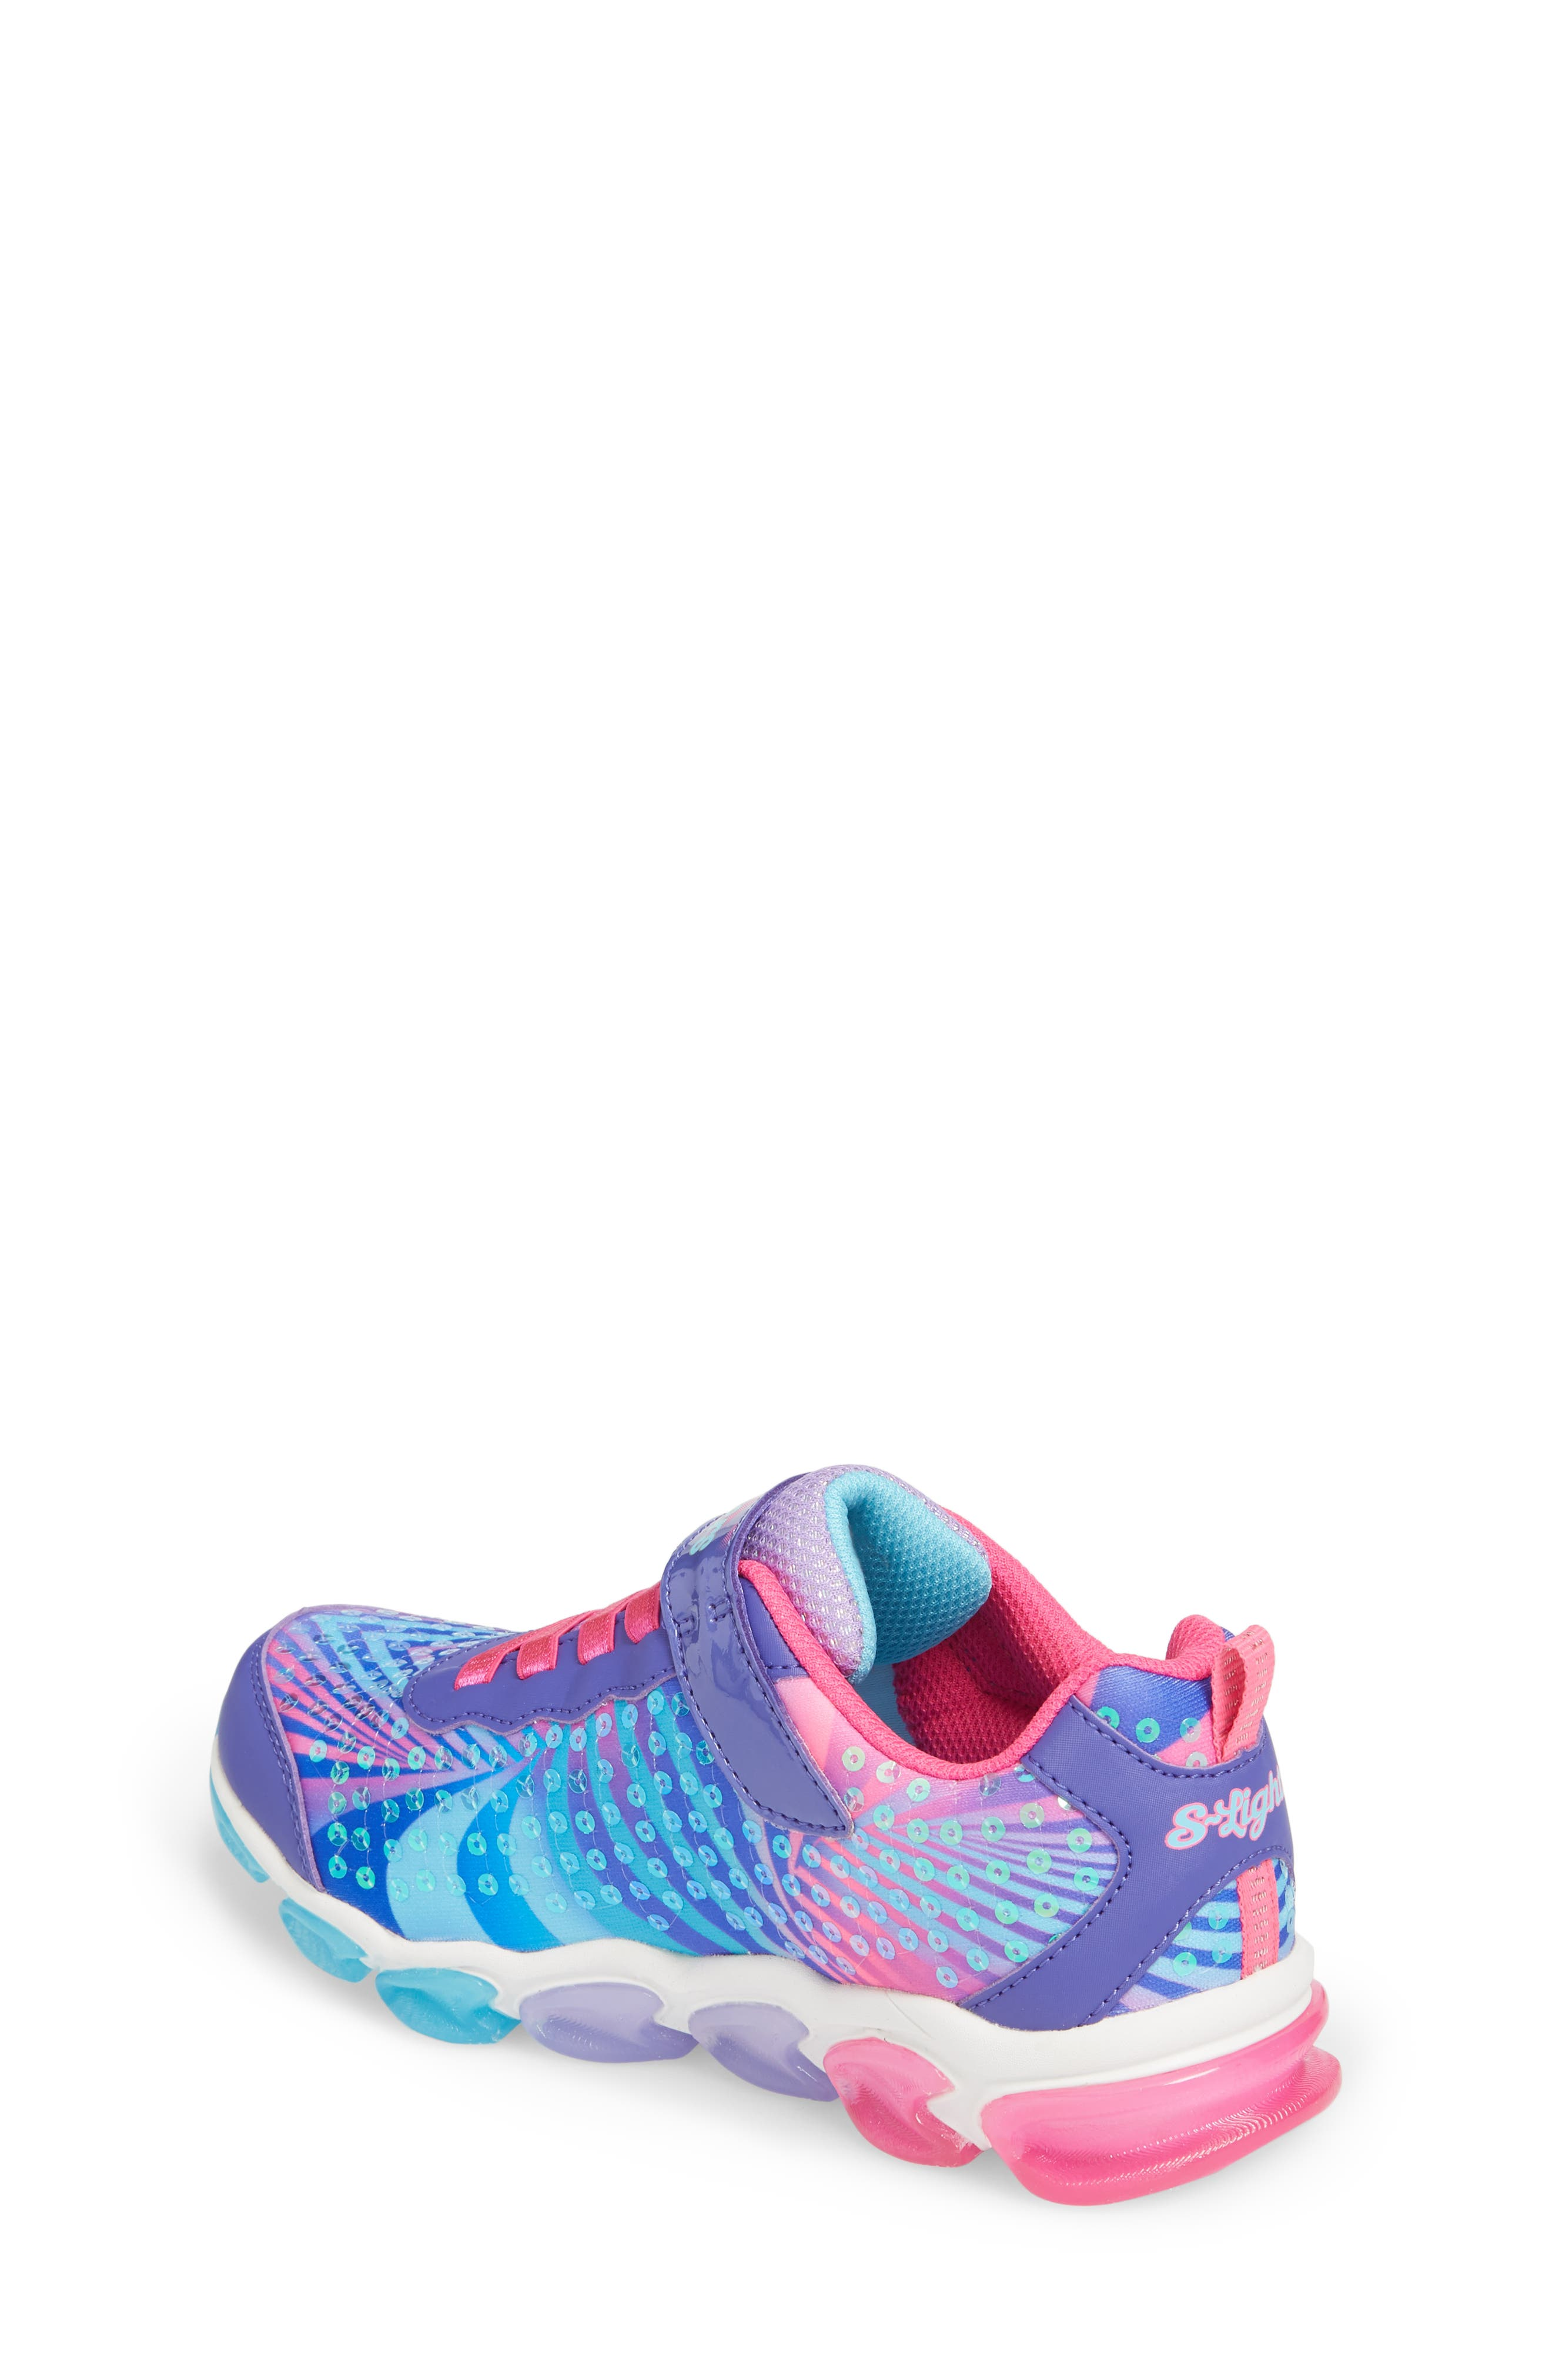 Jelly Beams Light-Up Sneaker,                             Alternate thumbnail 2, color,                             Purple/ Multi